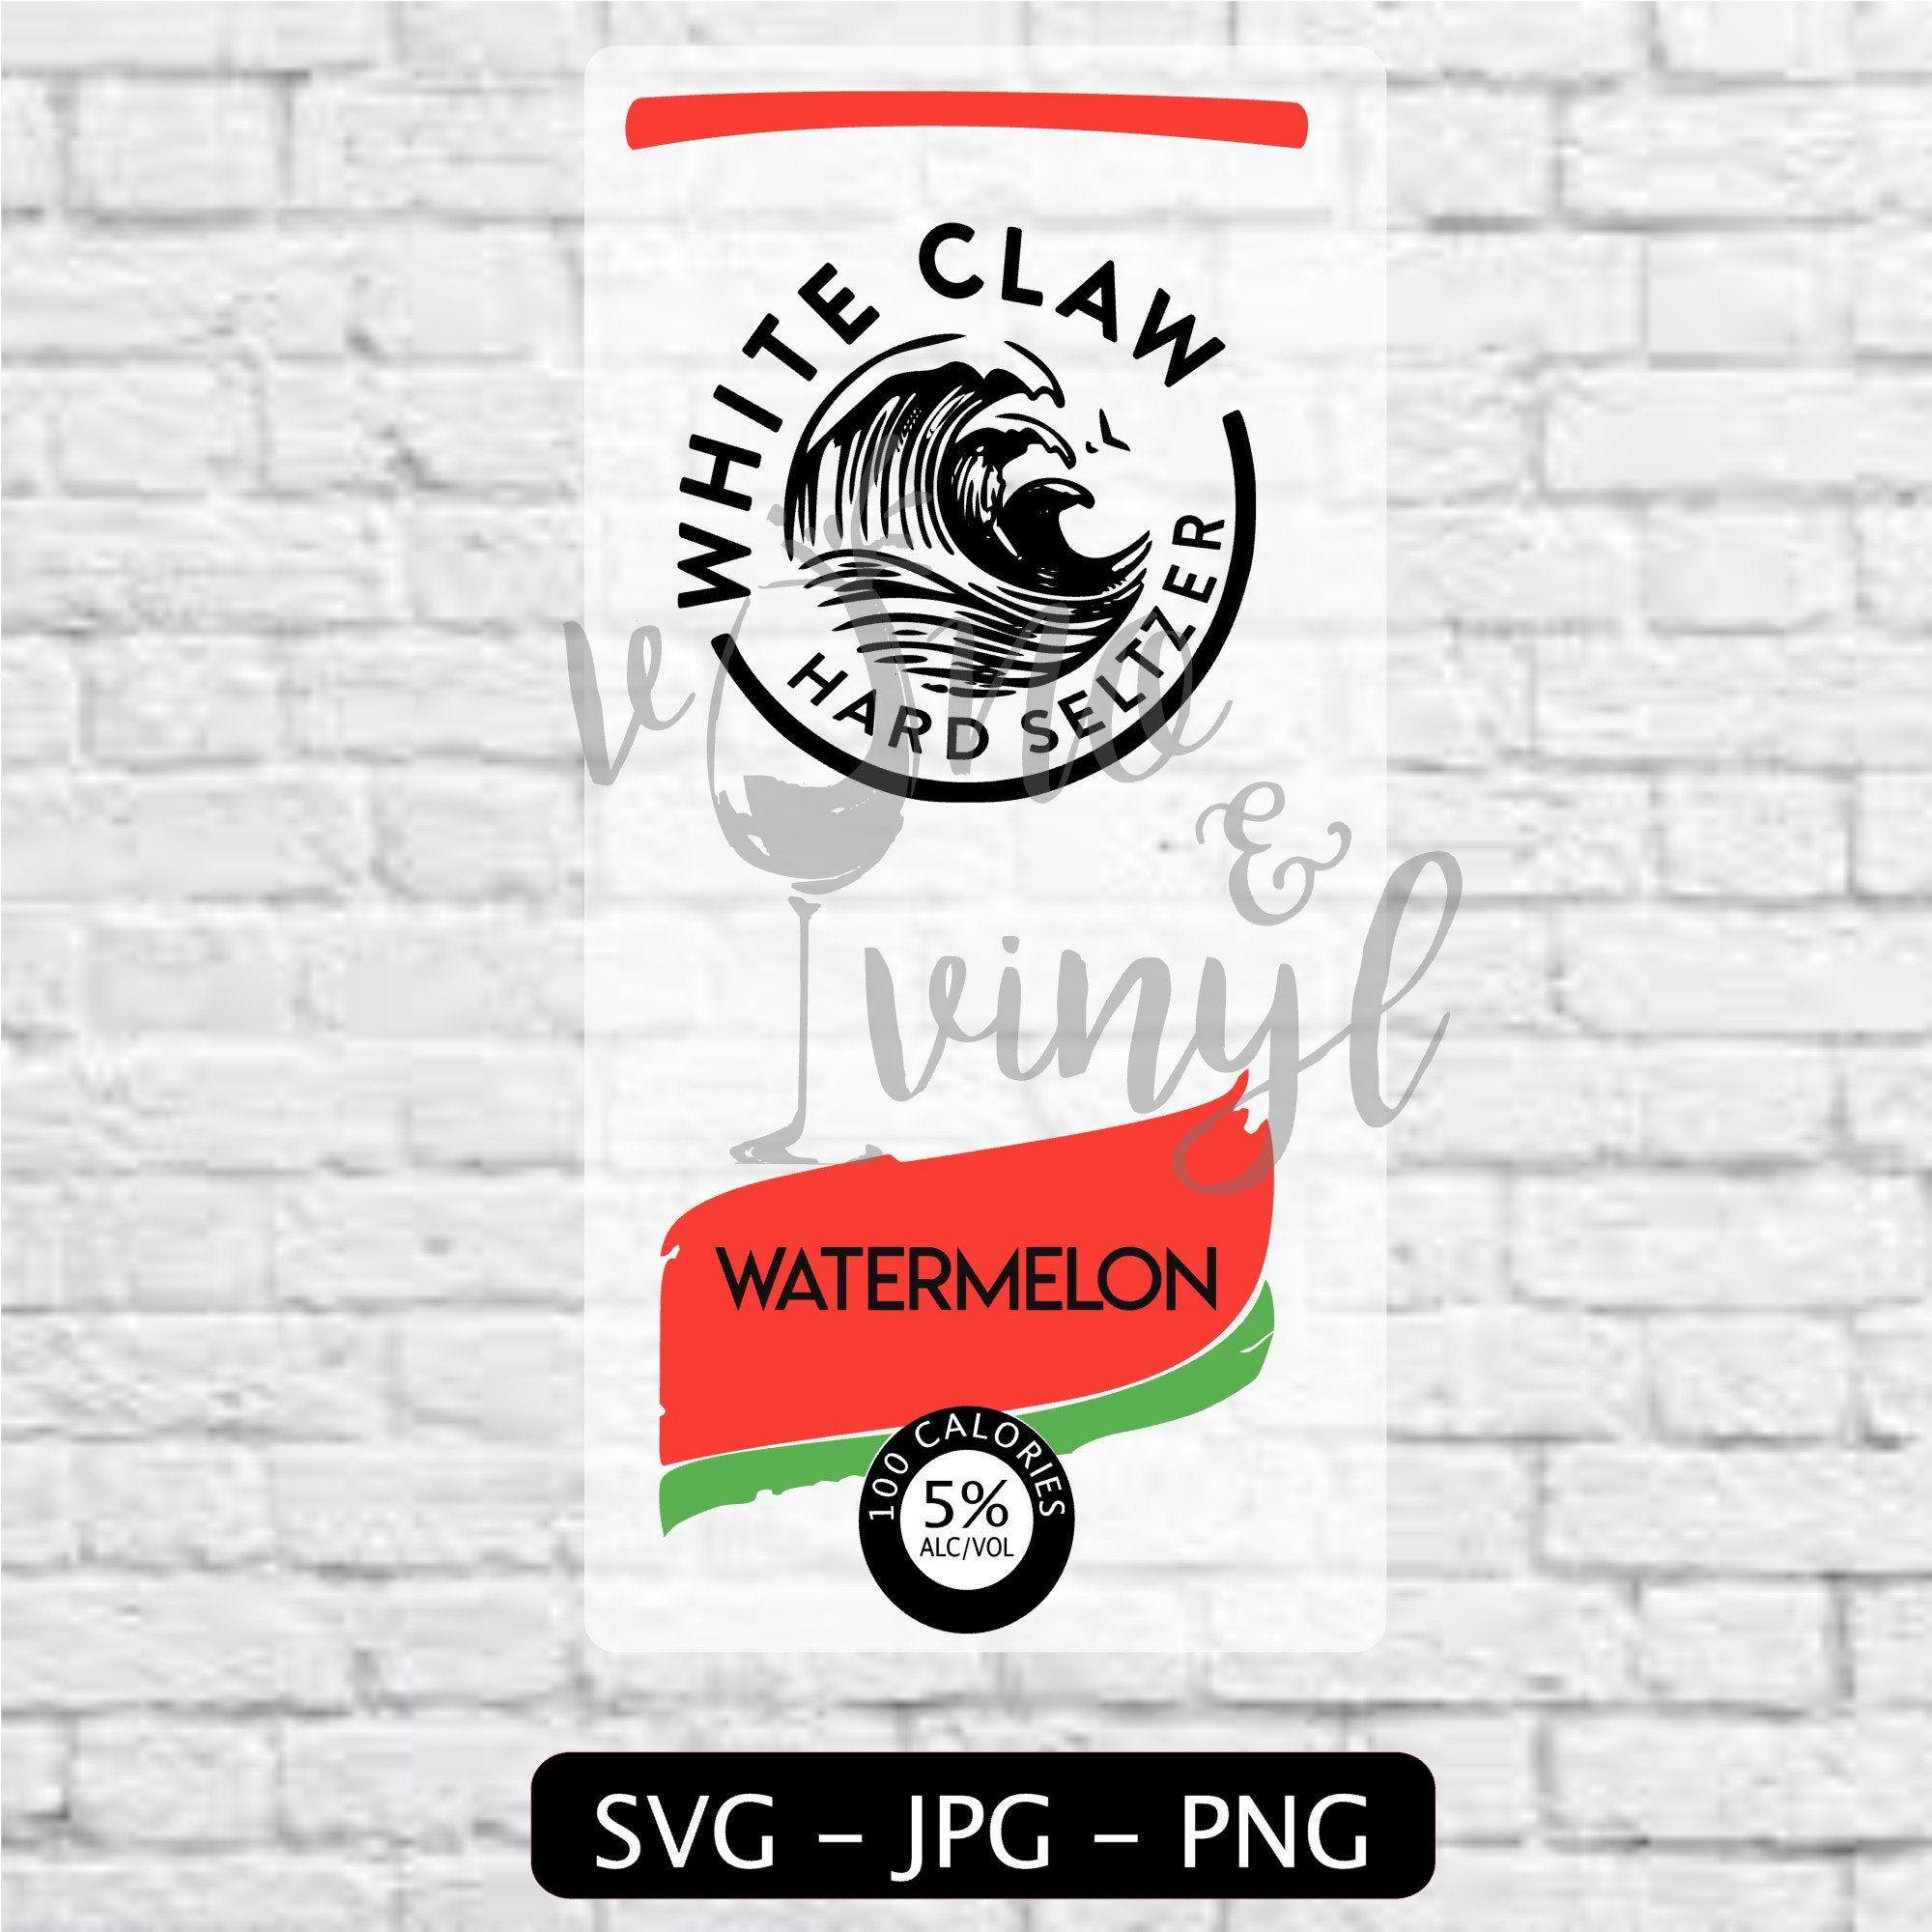 White Claw SVG & Image Watermelon Flavor in 2020 Svg